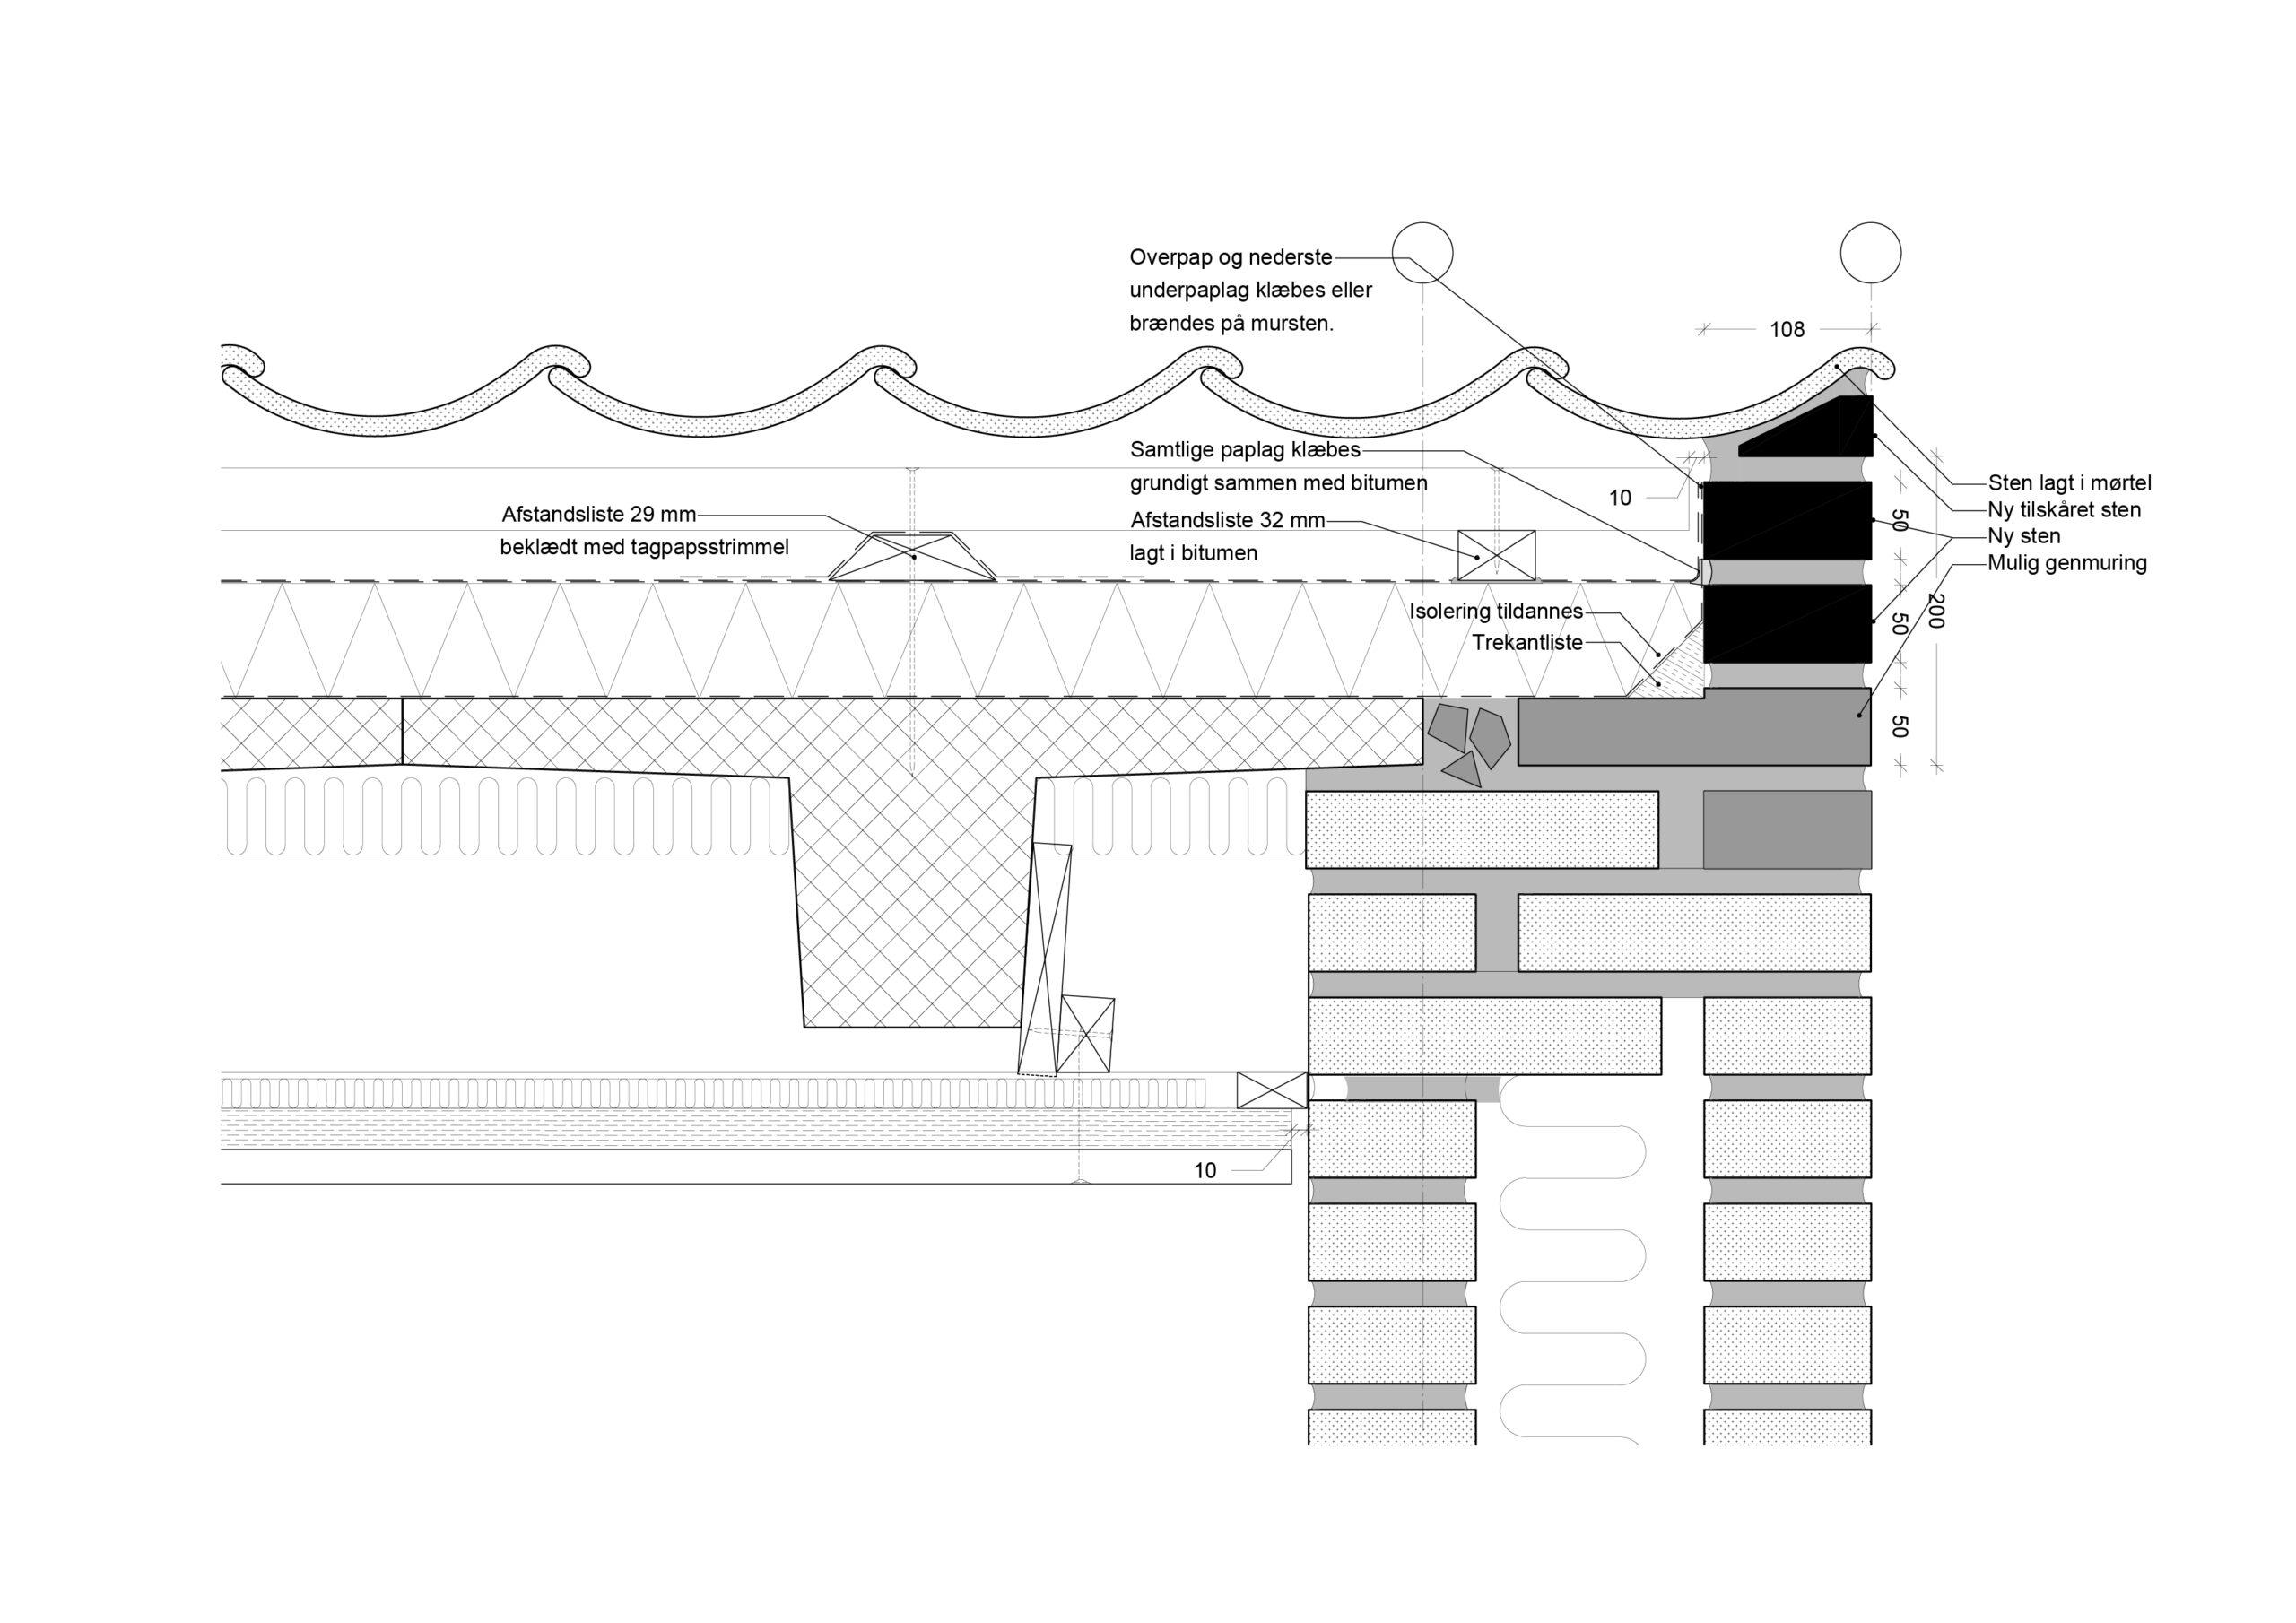 Bertelsen & Scheving - Gladsaxe Skole - Tagudskiftning